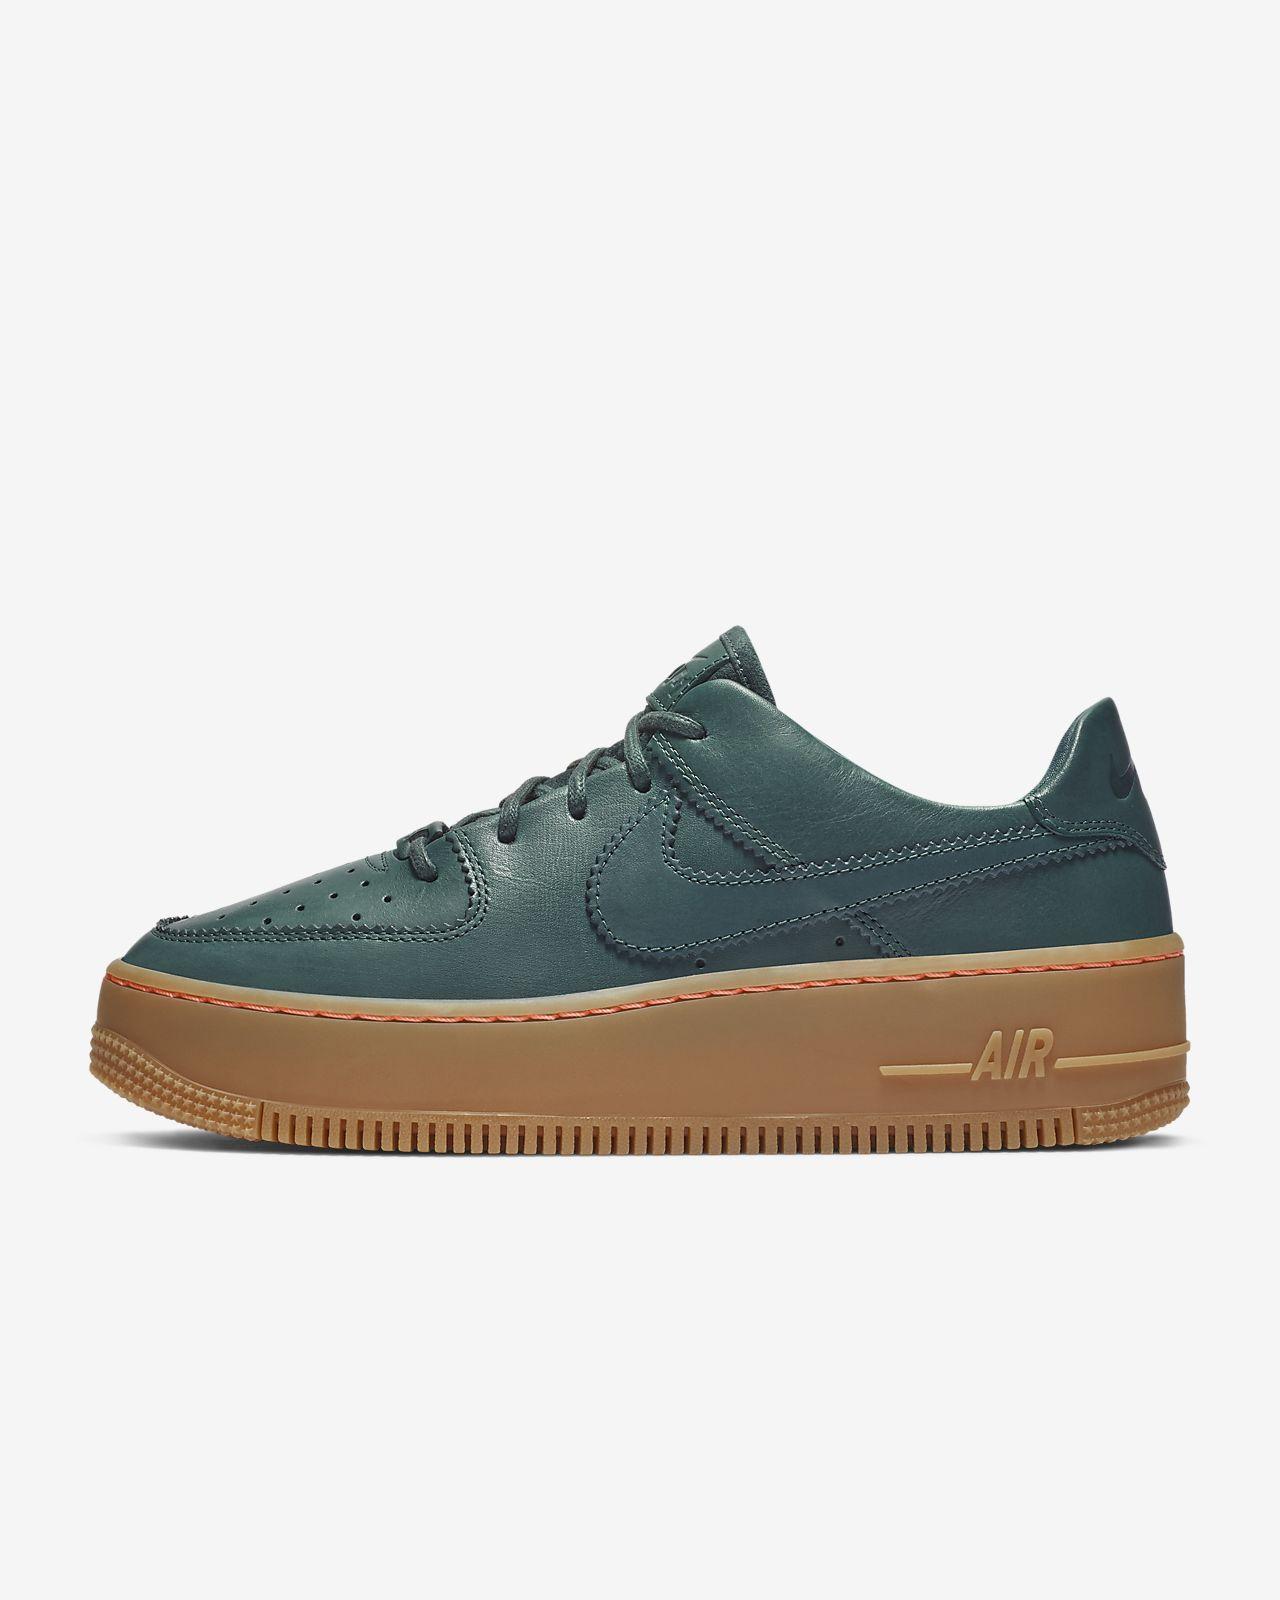 Nike Air Force 1 Sage Low LX damesko